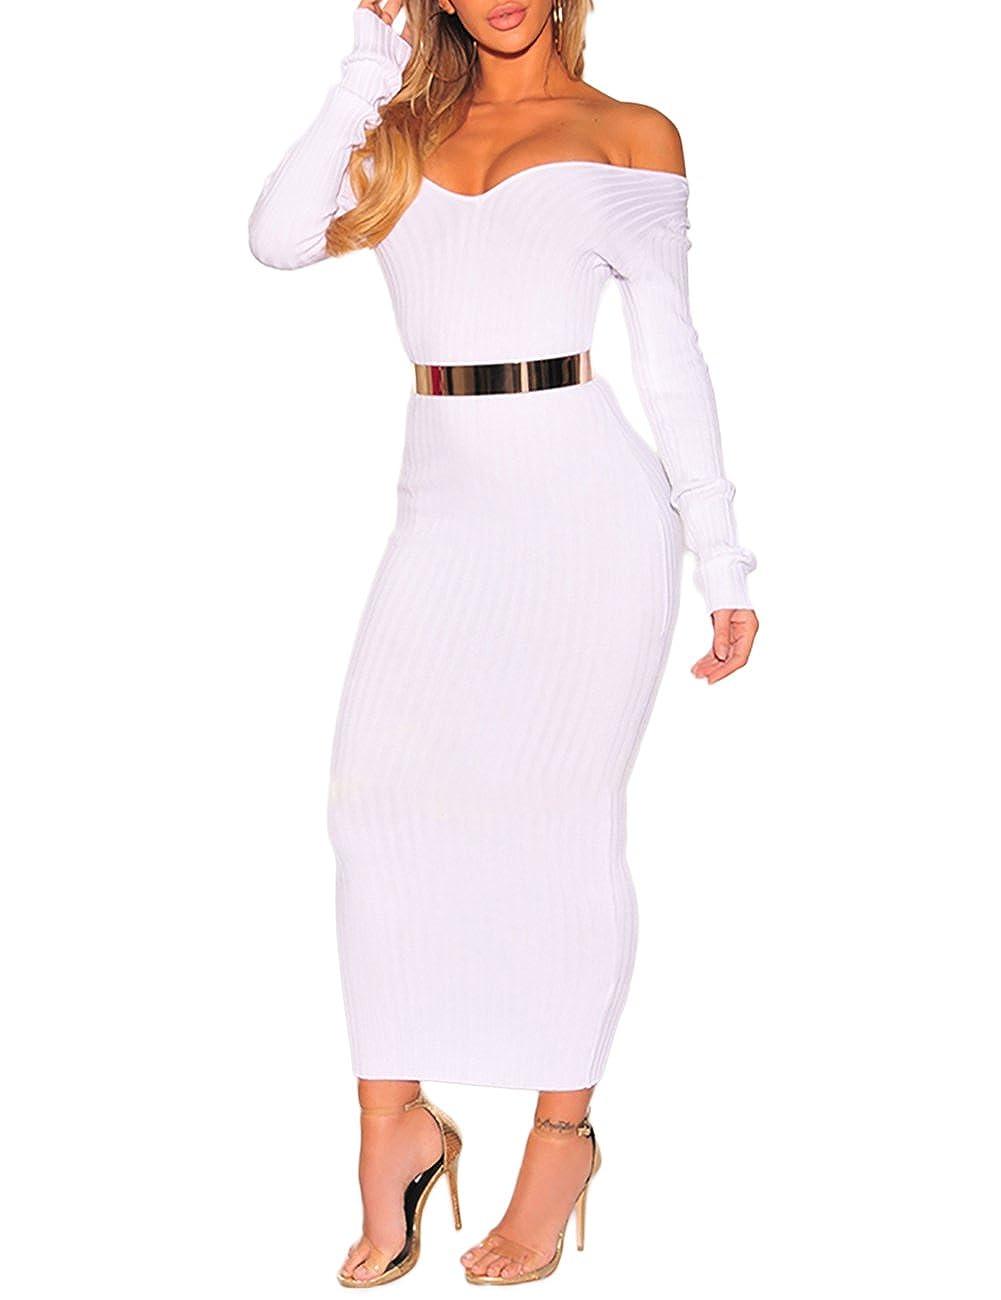 7e3b00f738 Top 10 wholesale Plain Bodycon Maxi Dress - Chinabrands.com